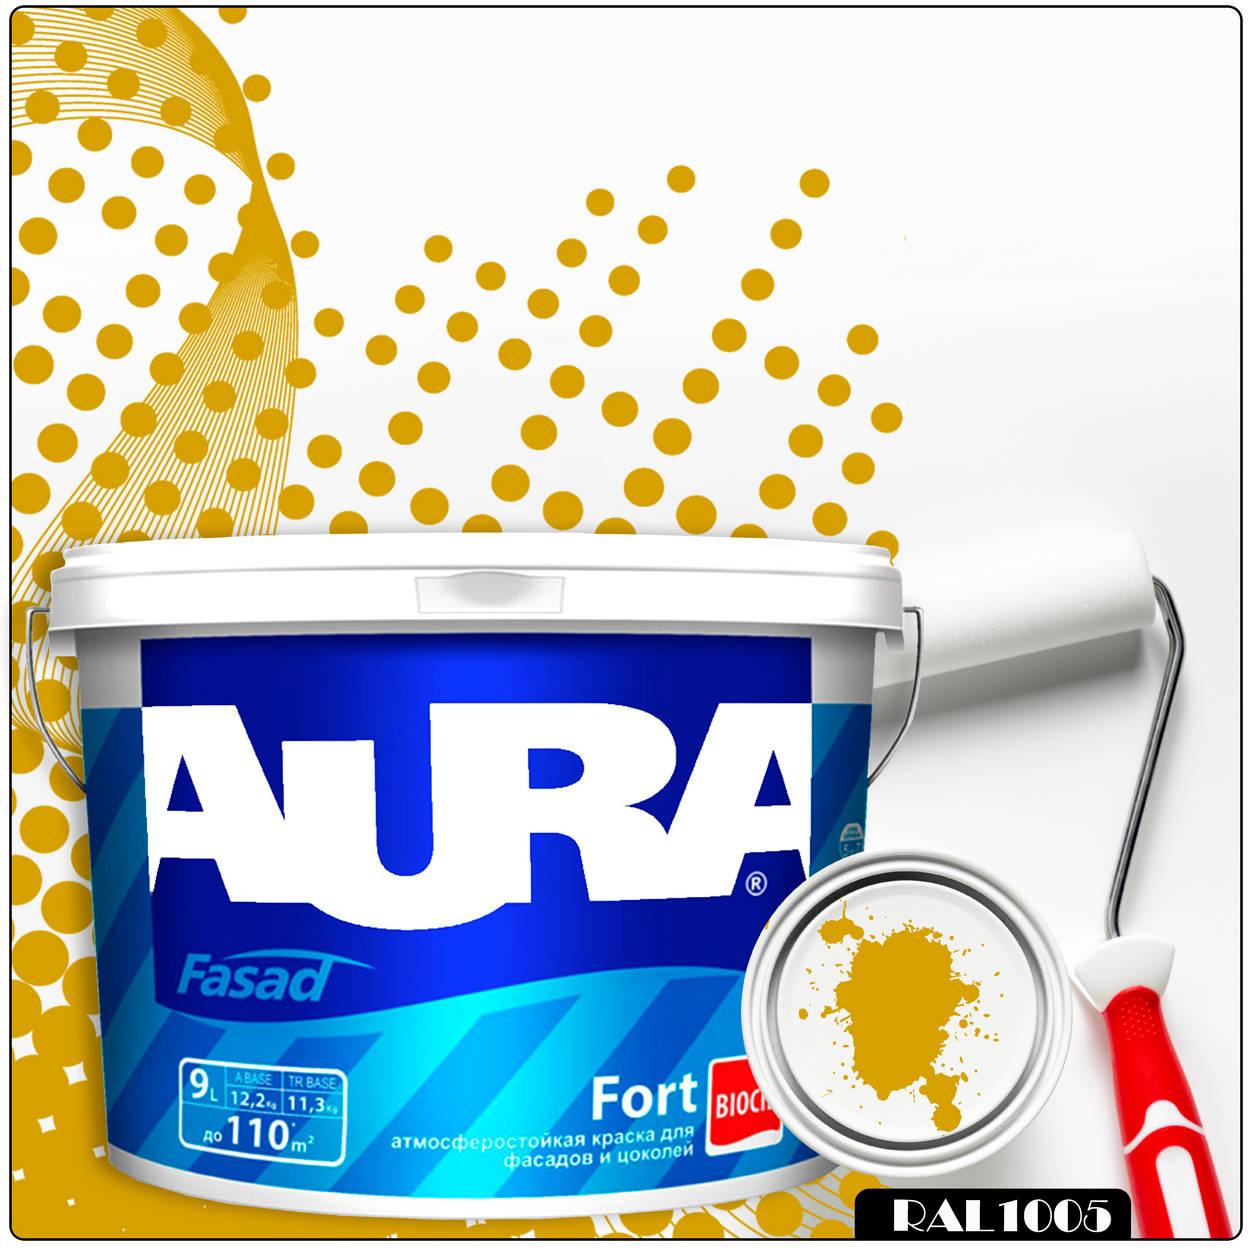 Фото 6 - Краска Aura Fasad Fort, RAL 1005 Медово-жёлтый, латексная, матовая, для фасада и цоколей, 9л, Аура.